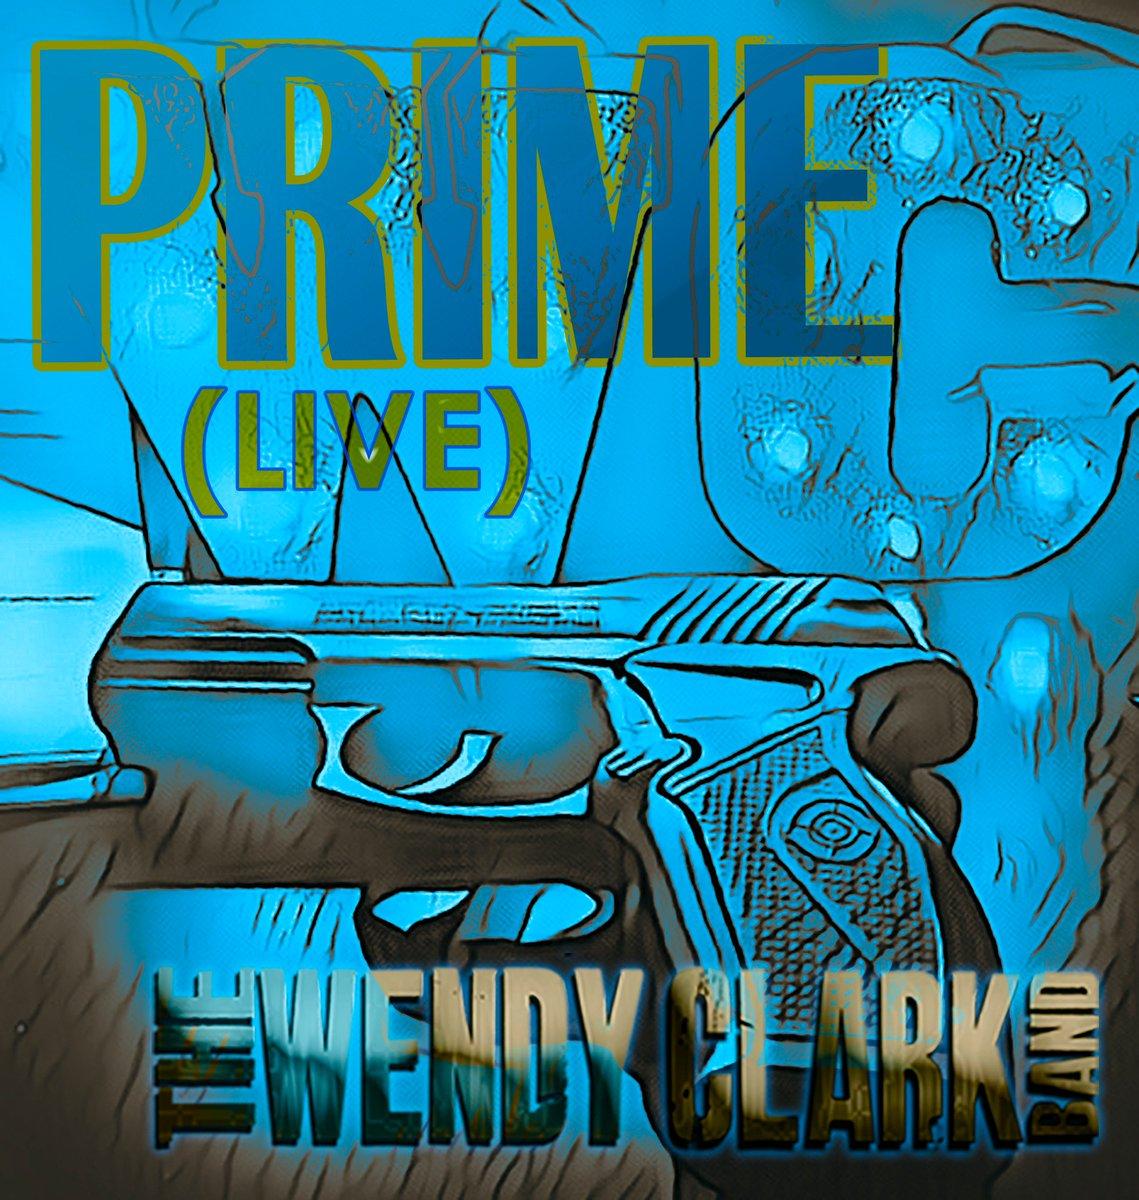 PRIME (LIVE at the Walnut Room) on Spotify!  https://open.spotify.com/artist/7MBMsdFfPtI0tjpdUoHdOv… #wcb #wendyclarkband pic.twitter.com/8rSd7Og3Xt